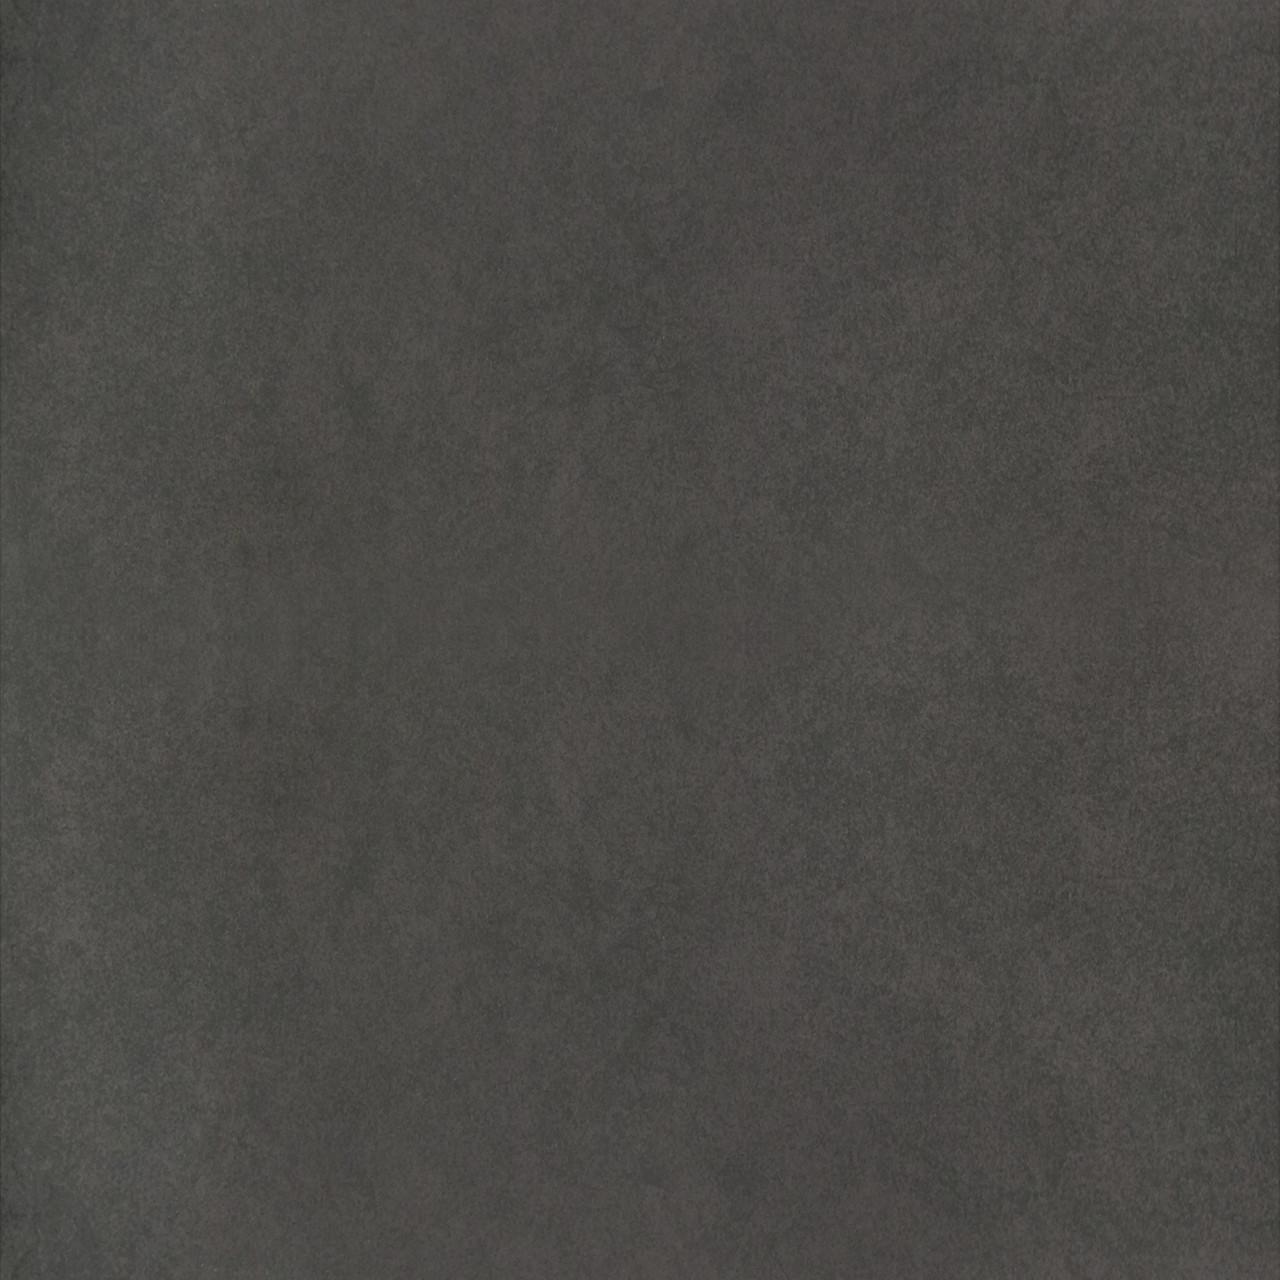 Плитка для пола ректифицированная Arc BK 600x600 /4 P